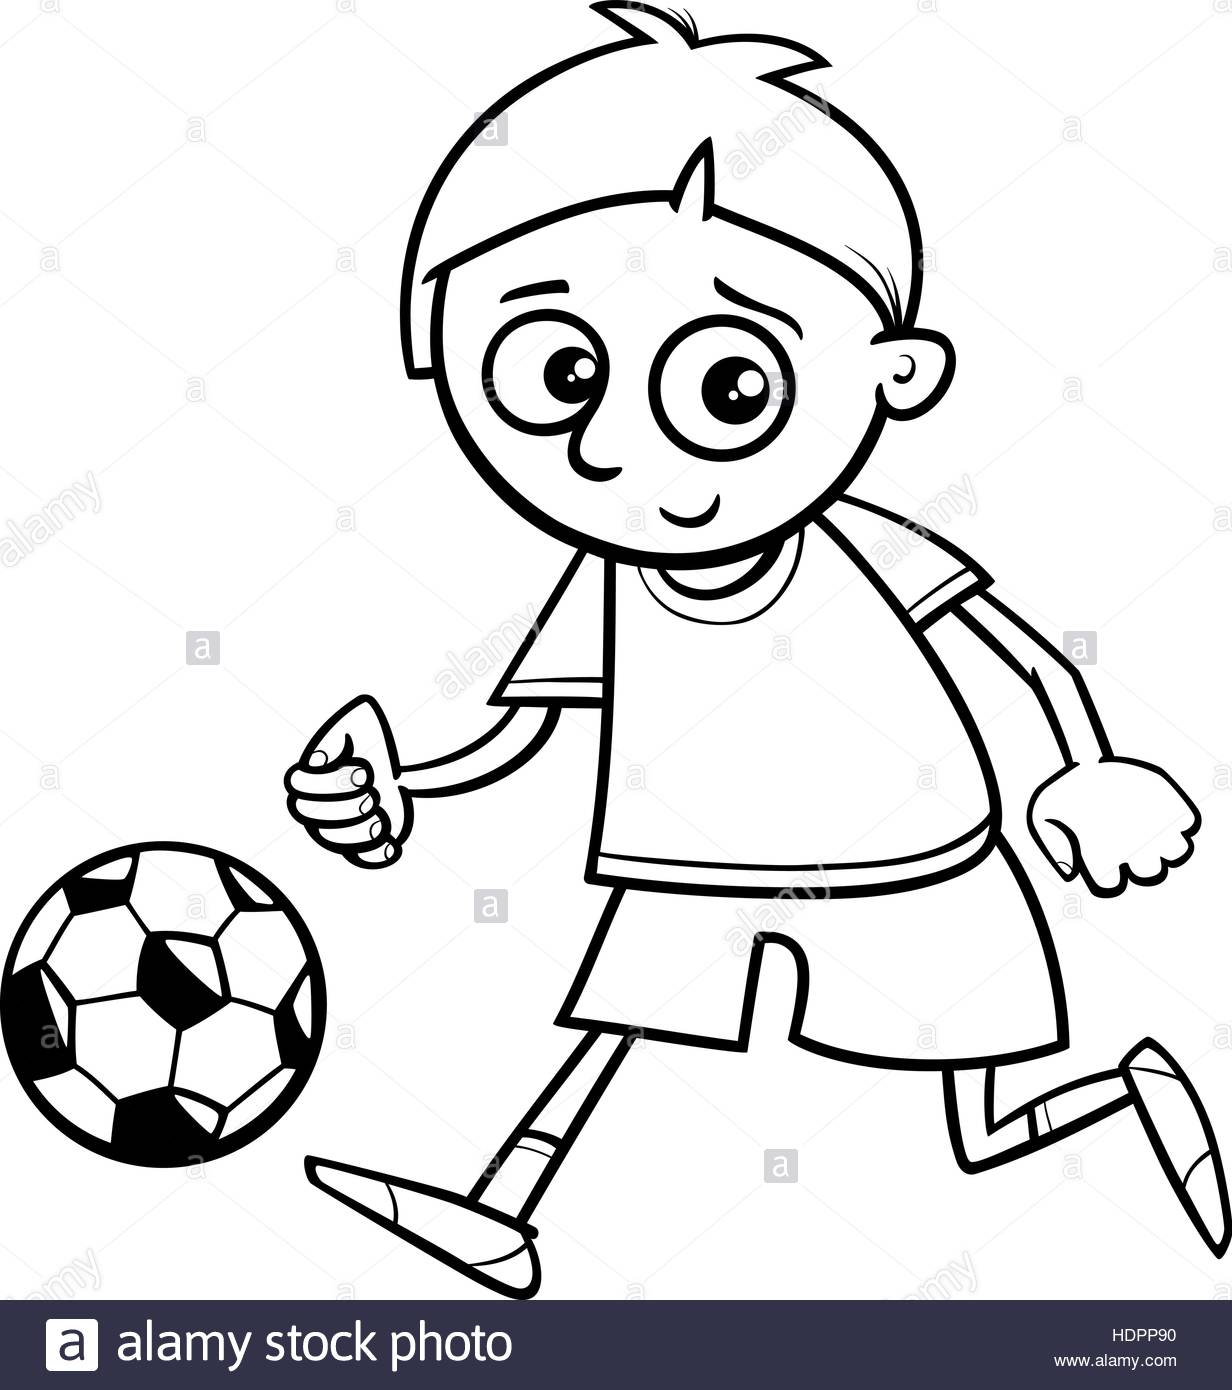 1232x1390 Boy Playing Football Drawing Black And White Cartoon Illustration